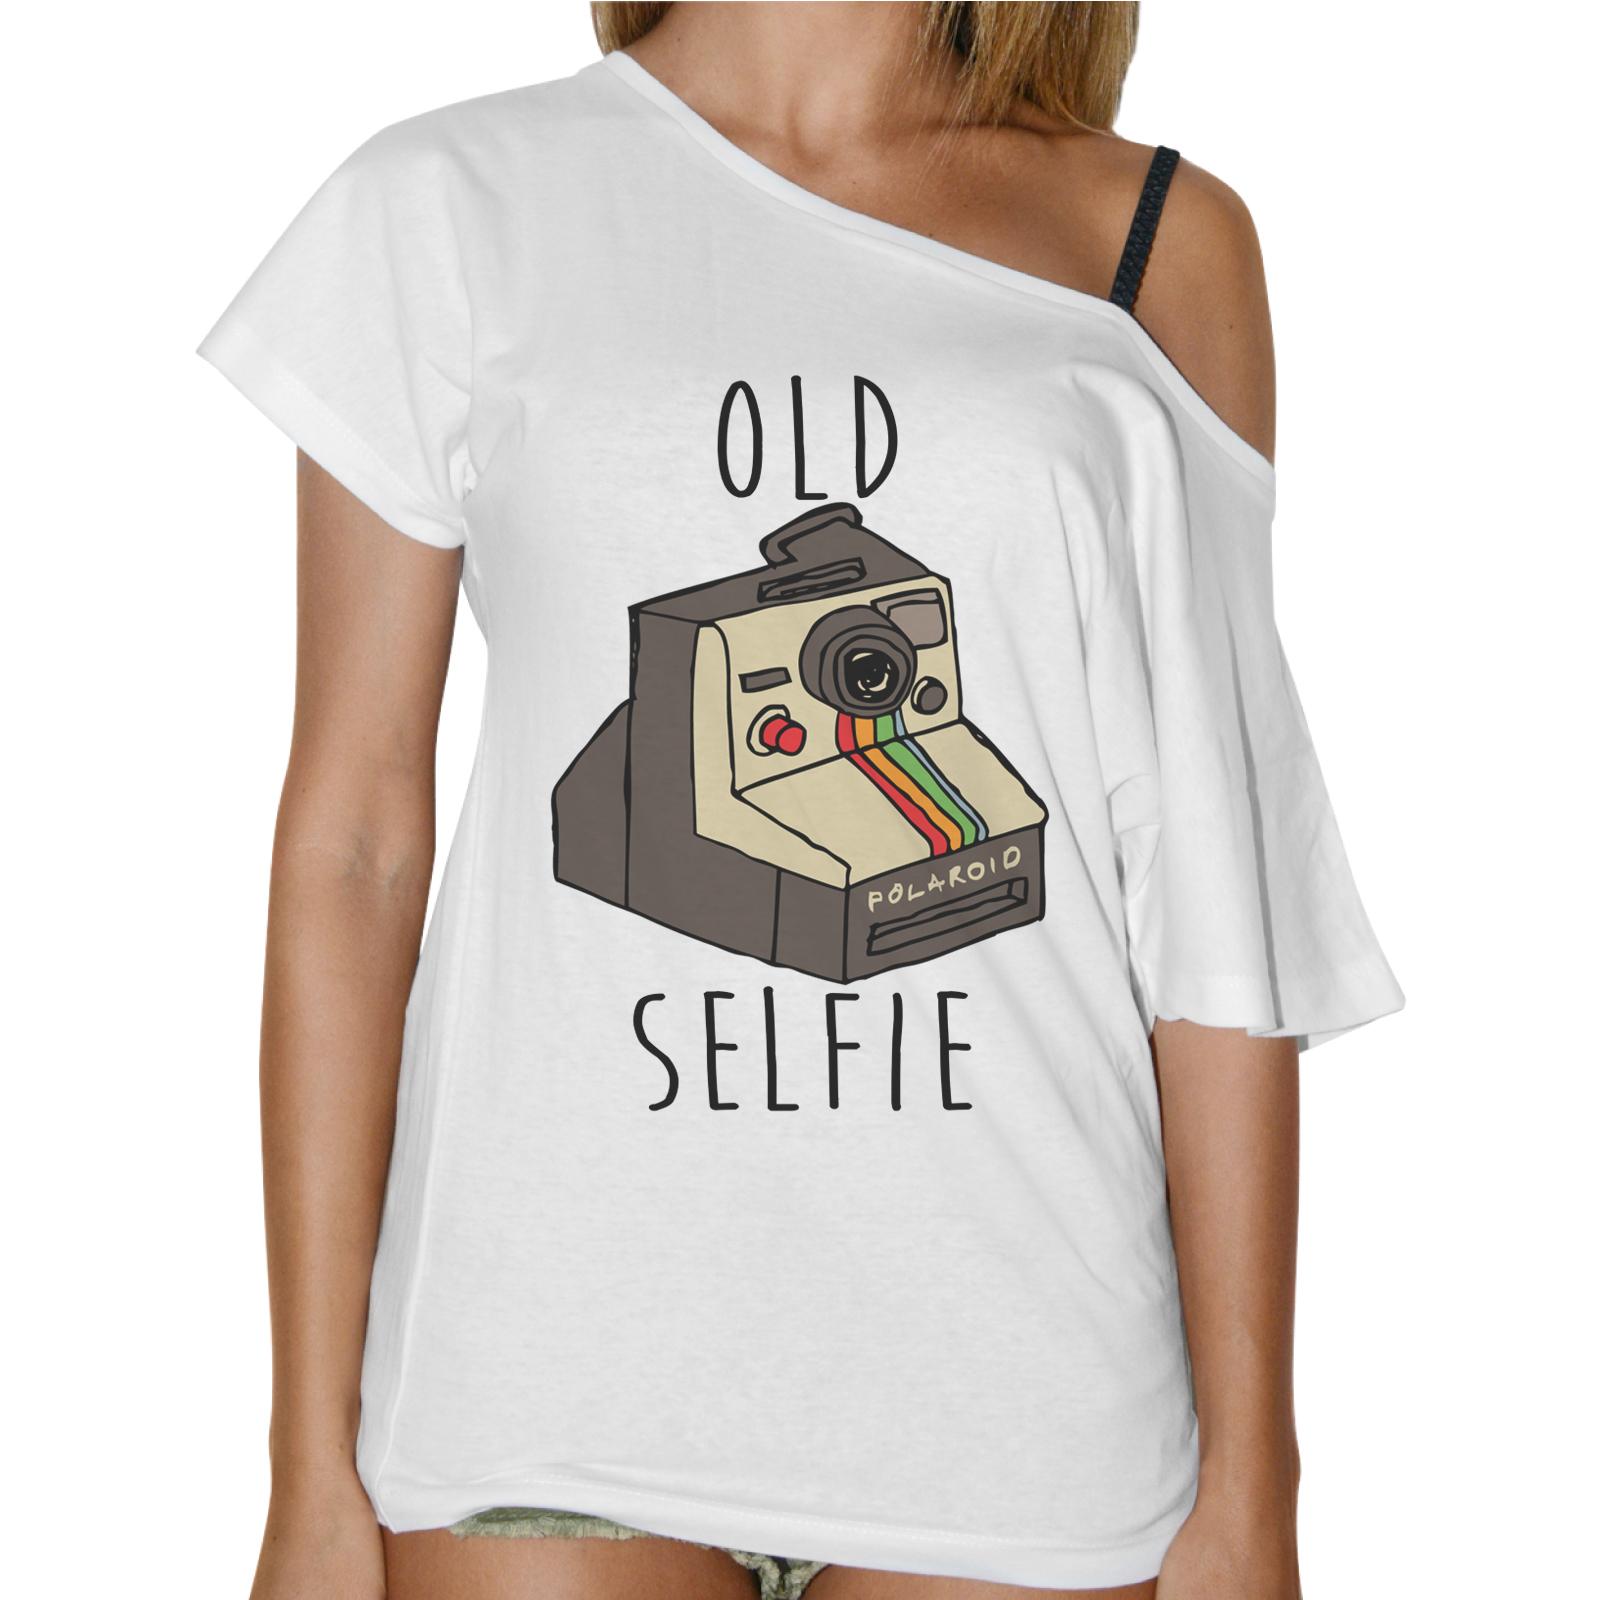 T-Shirt Donna Collo Barca OLD SELFIE